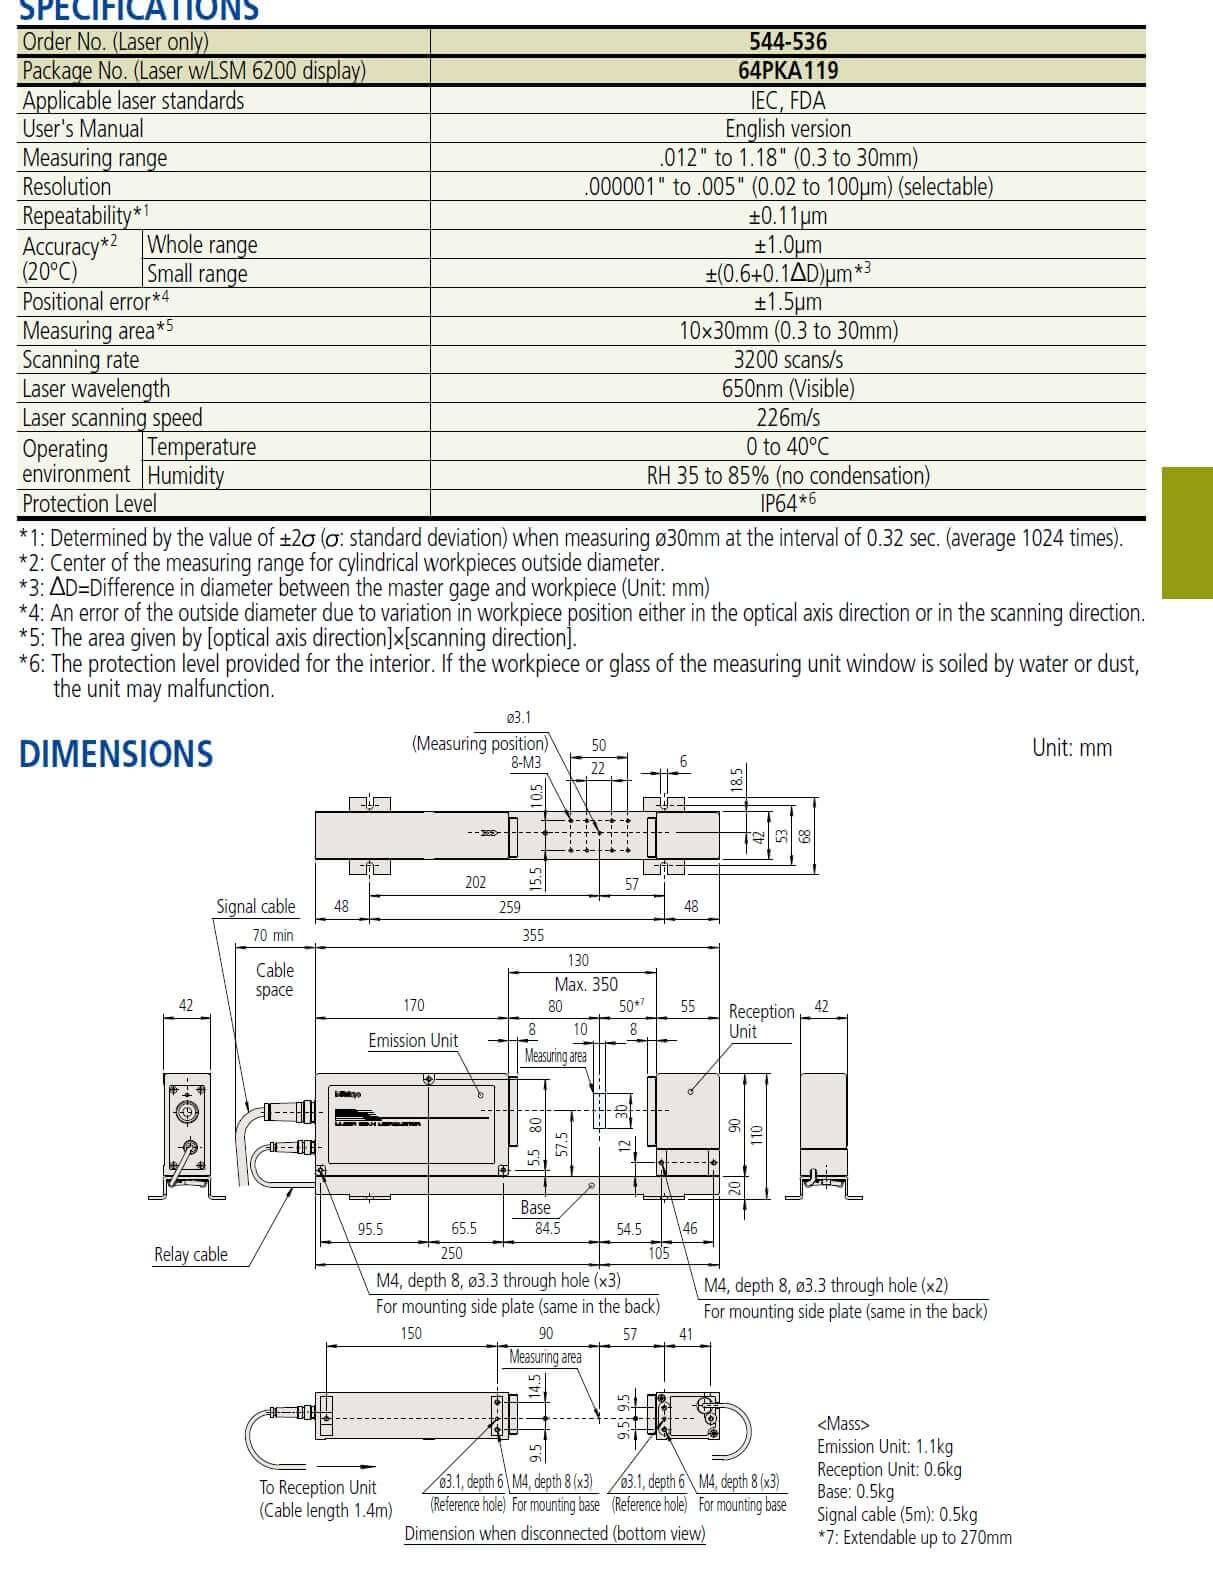 mitutoyo lsm-503s laser micrometer